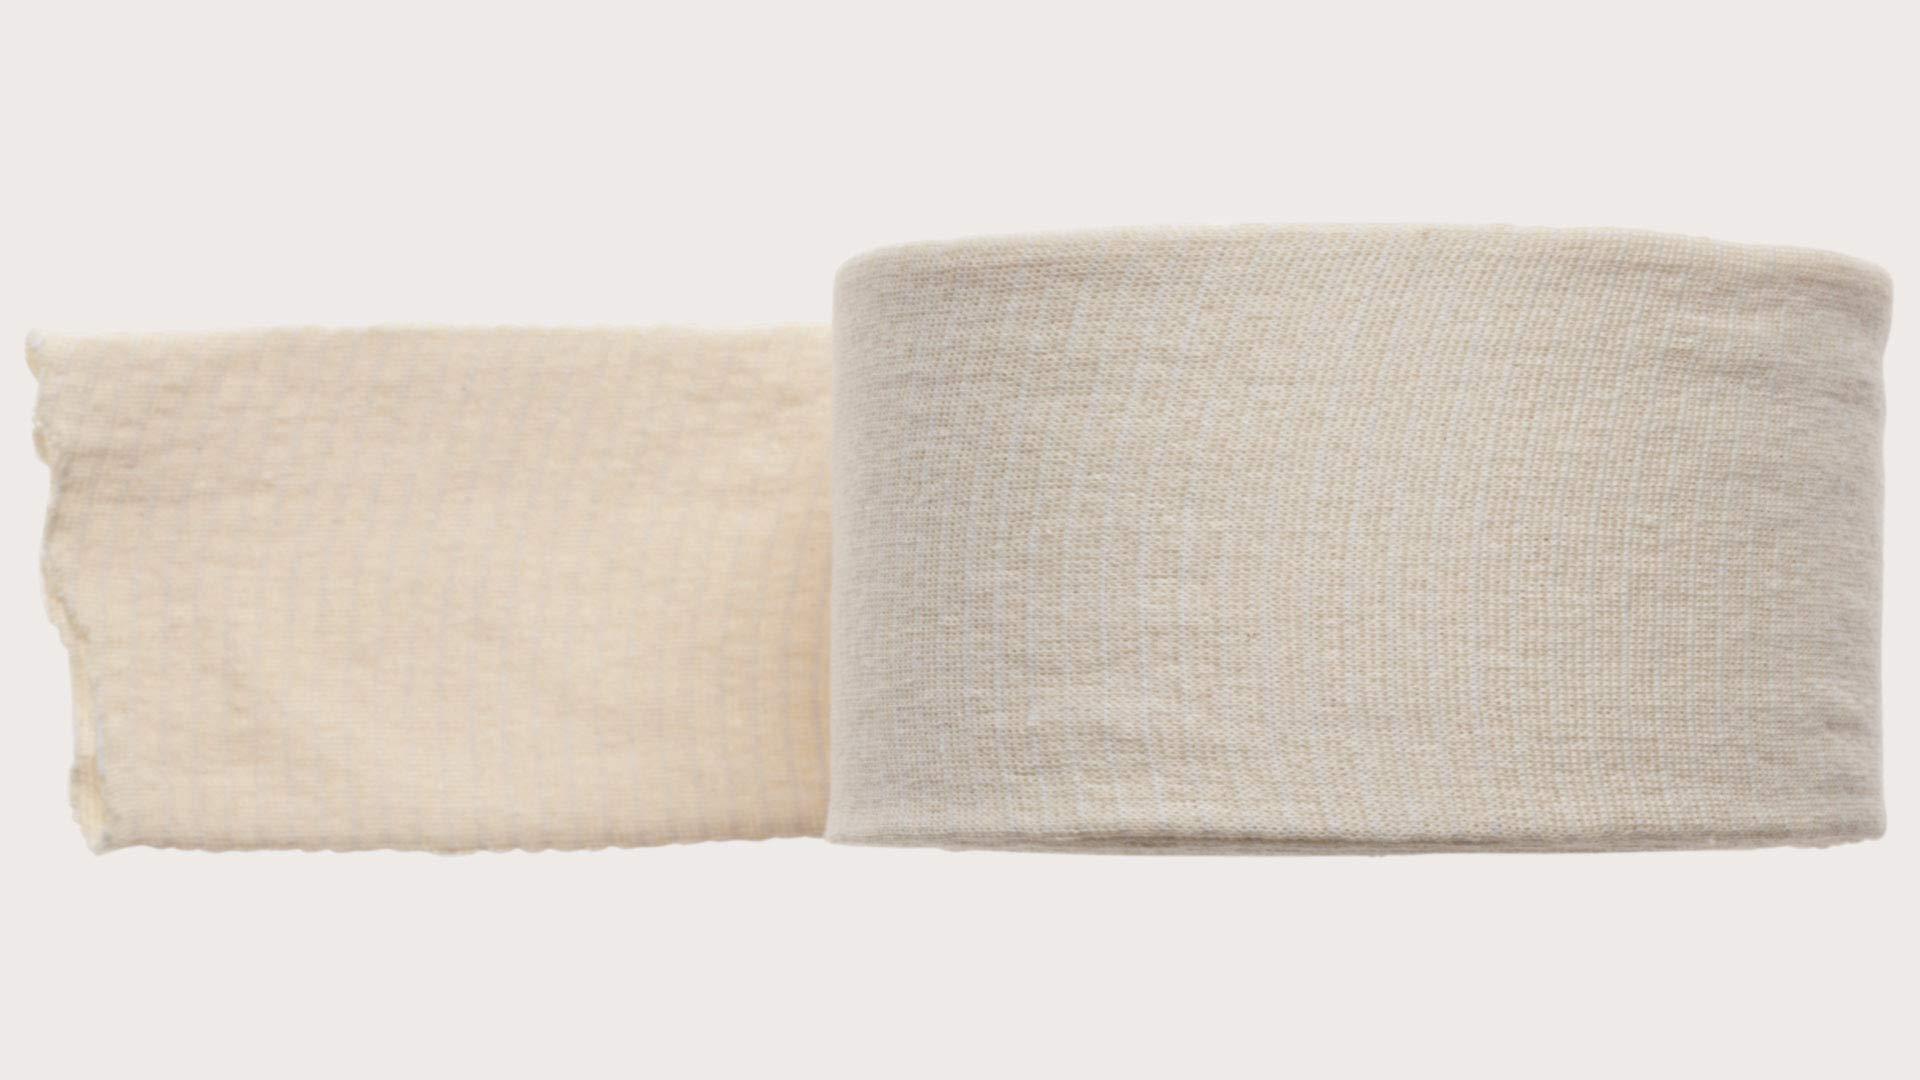 Molnlycke 1448 Tubigrip Multipurpose Tubular Bandage, E, Beige by Molnlycke